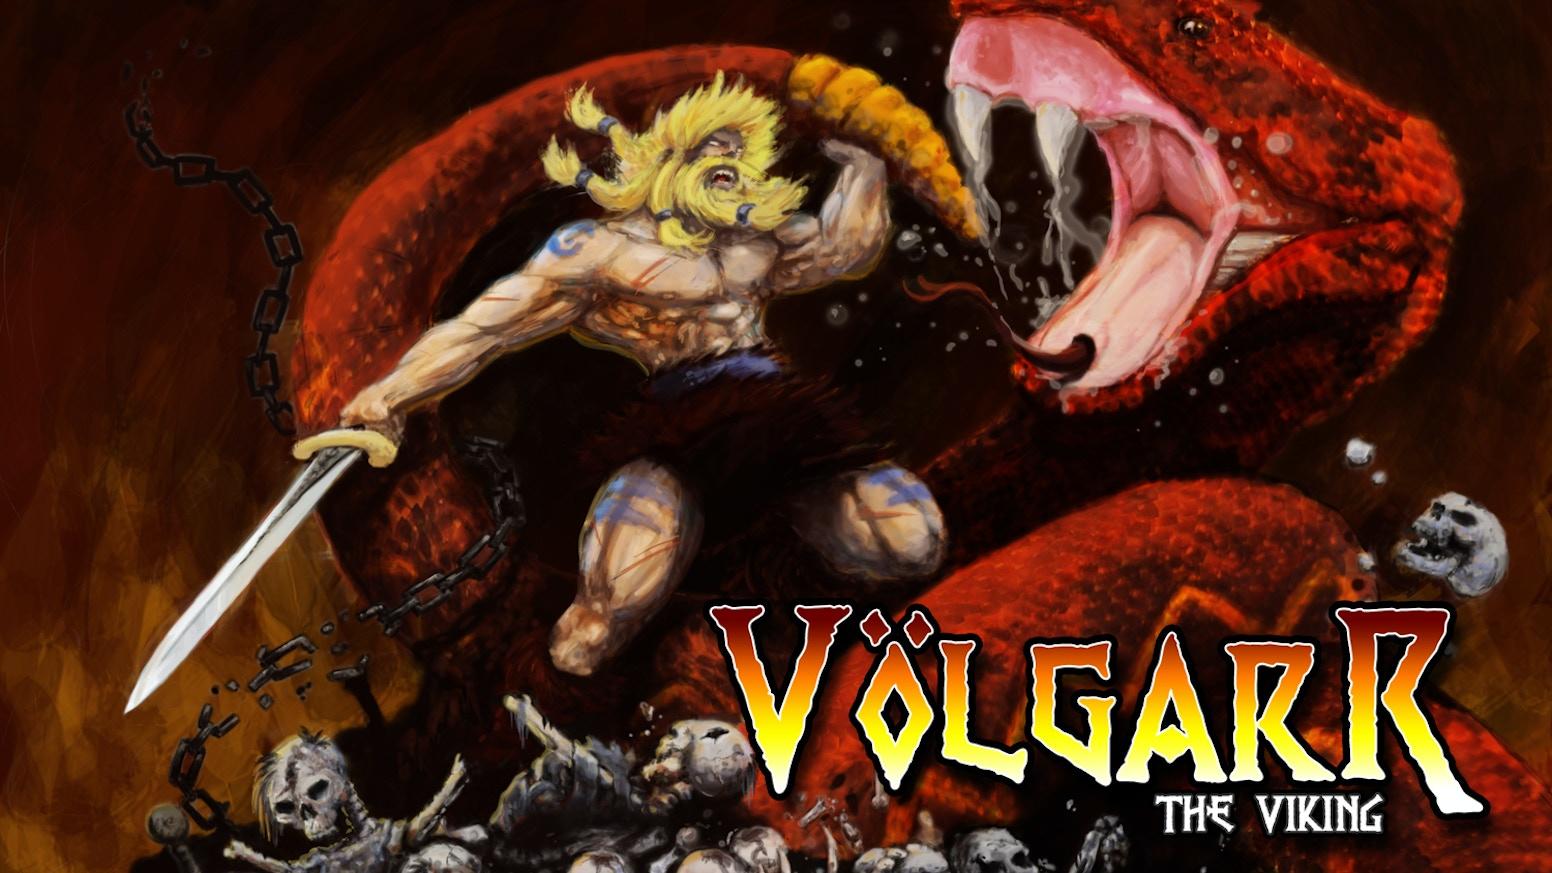 Volgarr the Viking by Crazy Viking Studios — Kickstarter